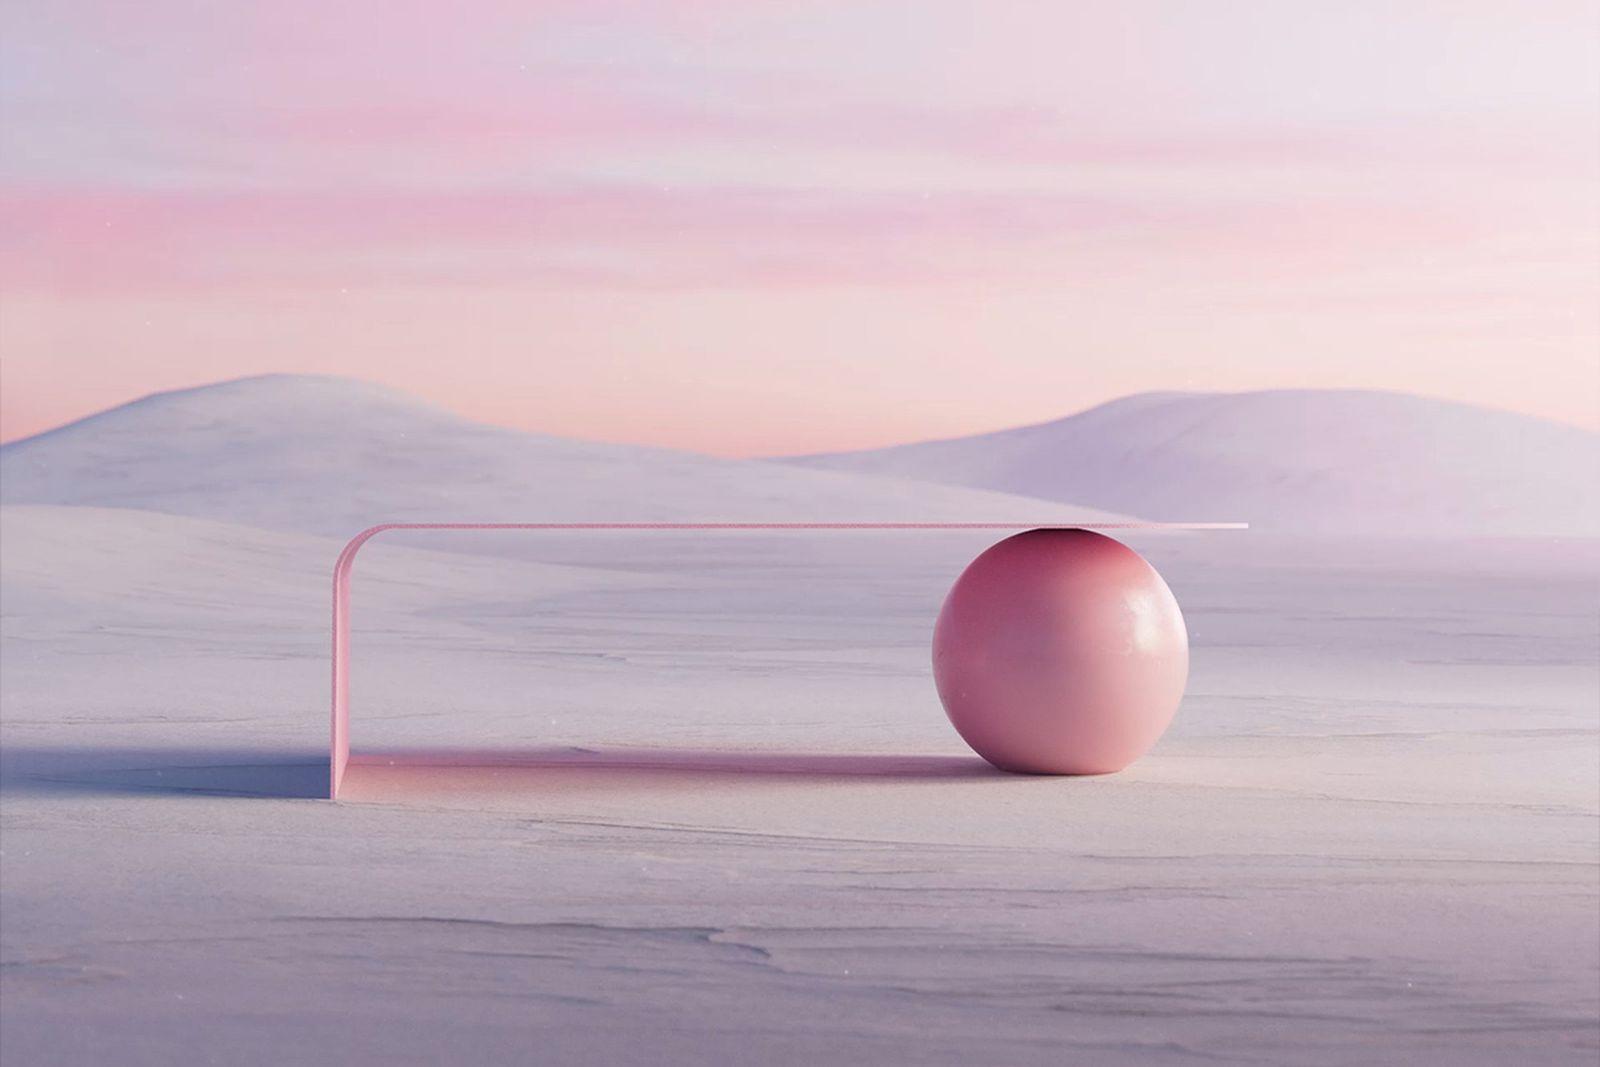 andres-reisinger-the-shipping-digital-furniture-auction-10